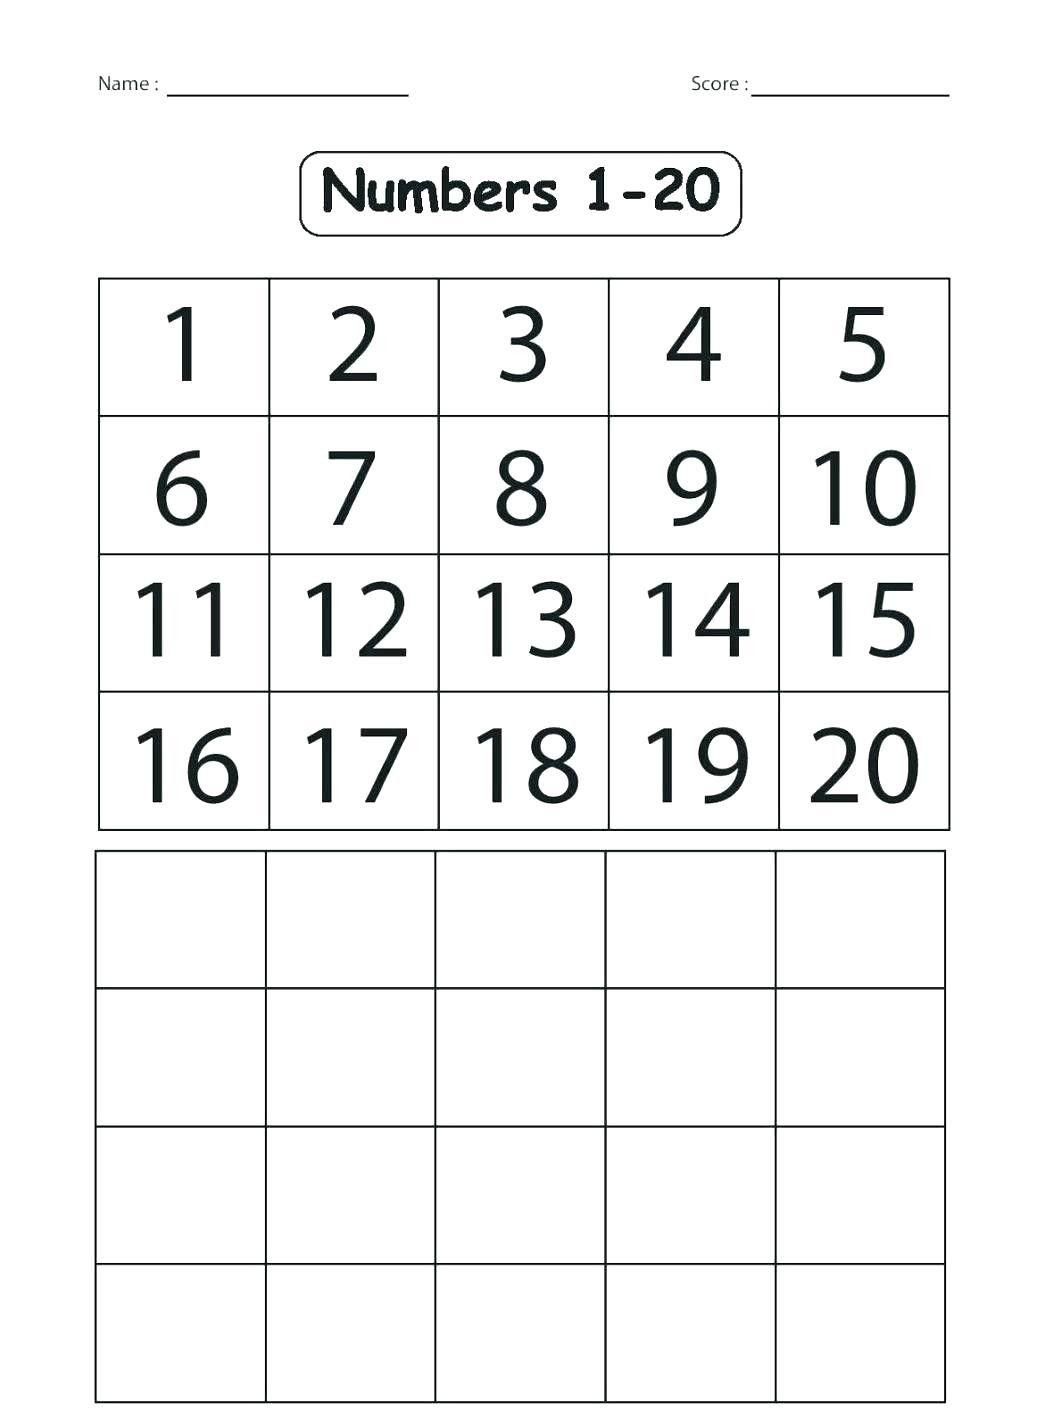 4 Numbers 1 20 Printable Free Number Recognition Worksheets 1 20 Outpostsheet Number Worksheets Kindergarten Numbers Kindergarten Number Writing Worksheets